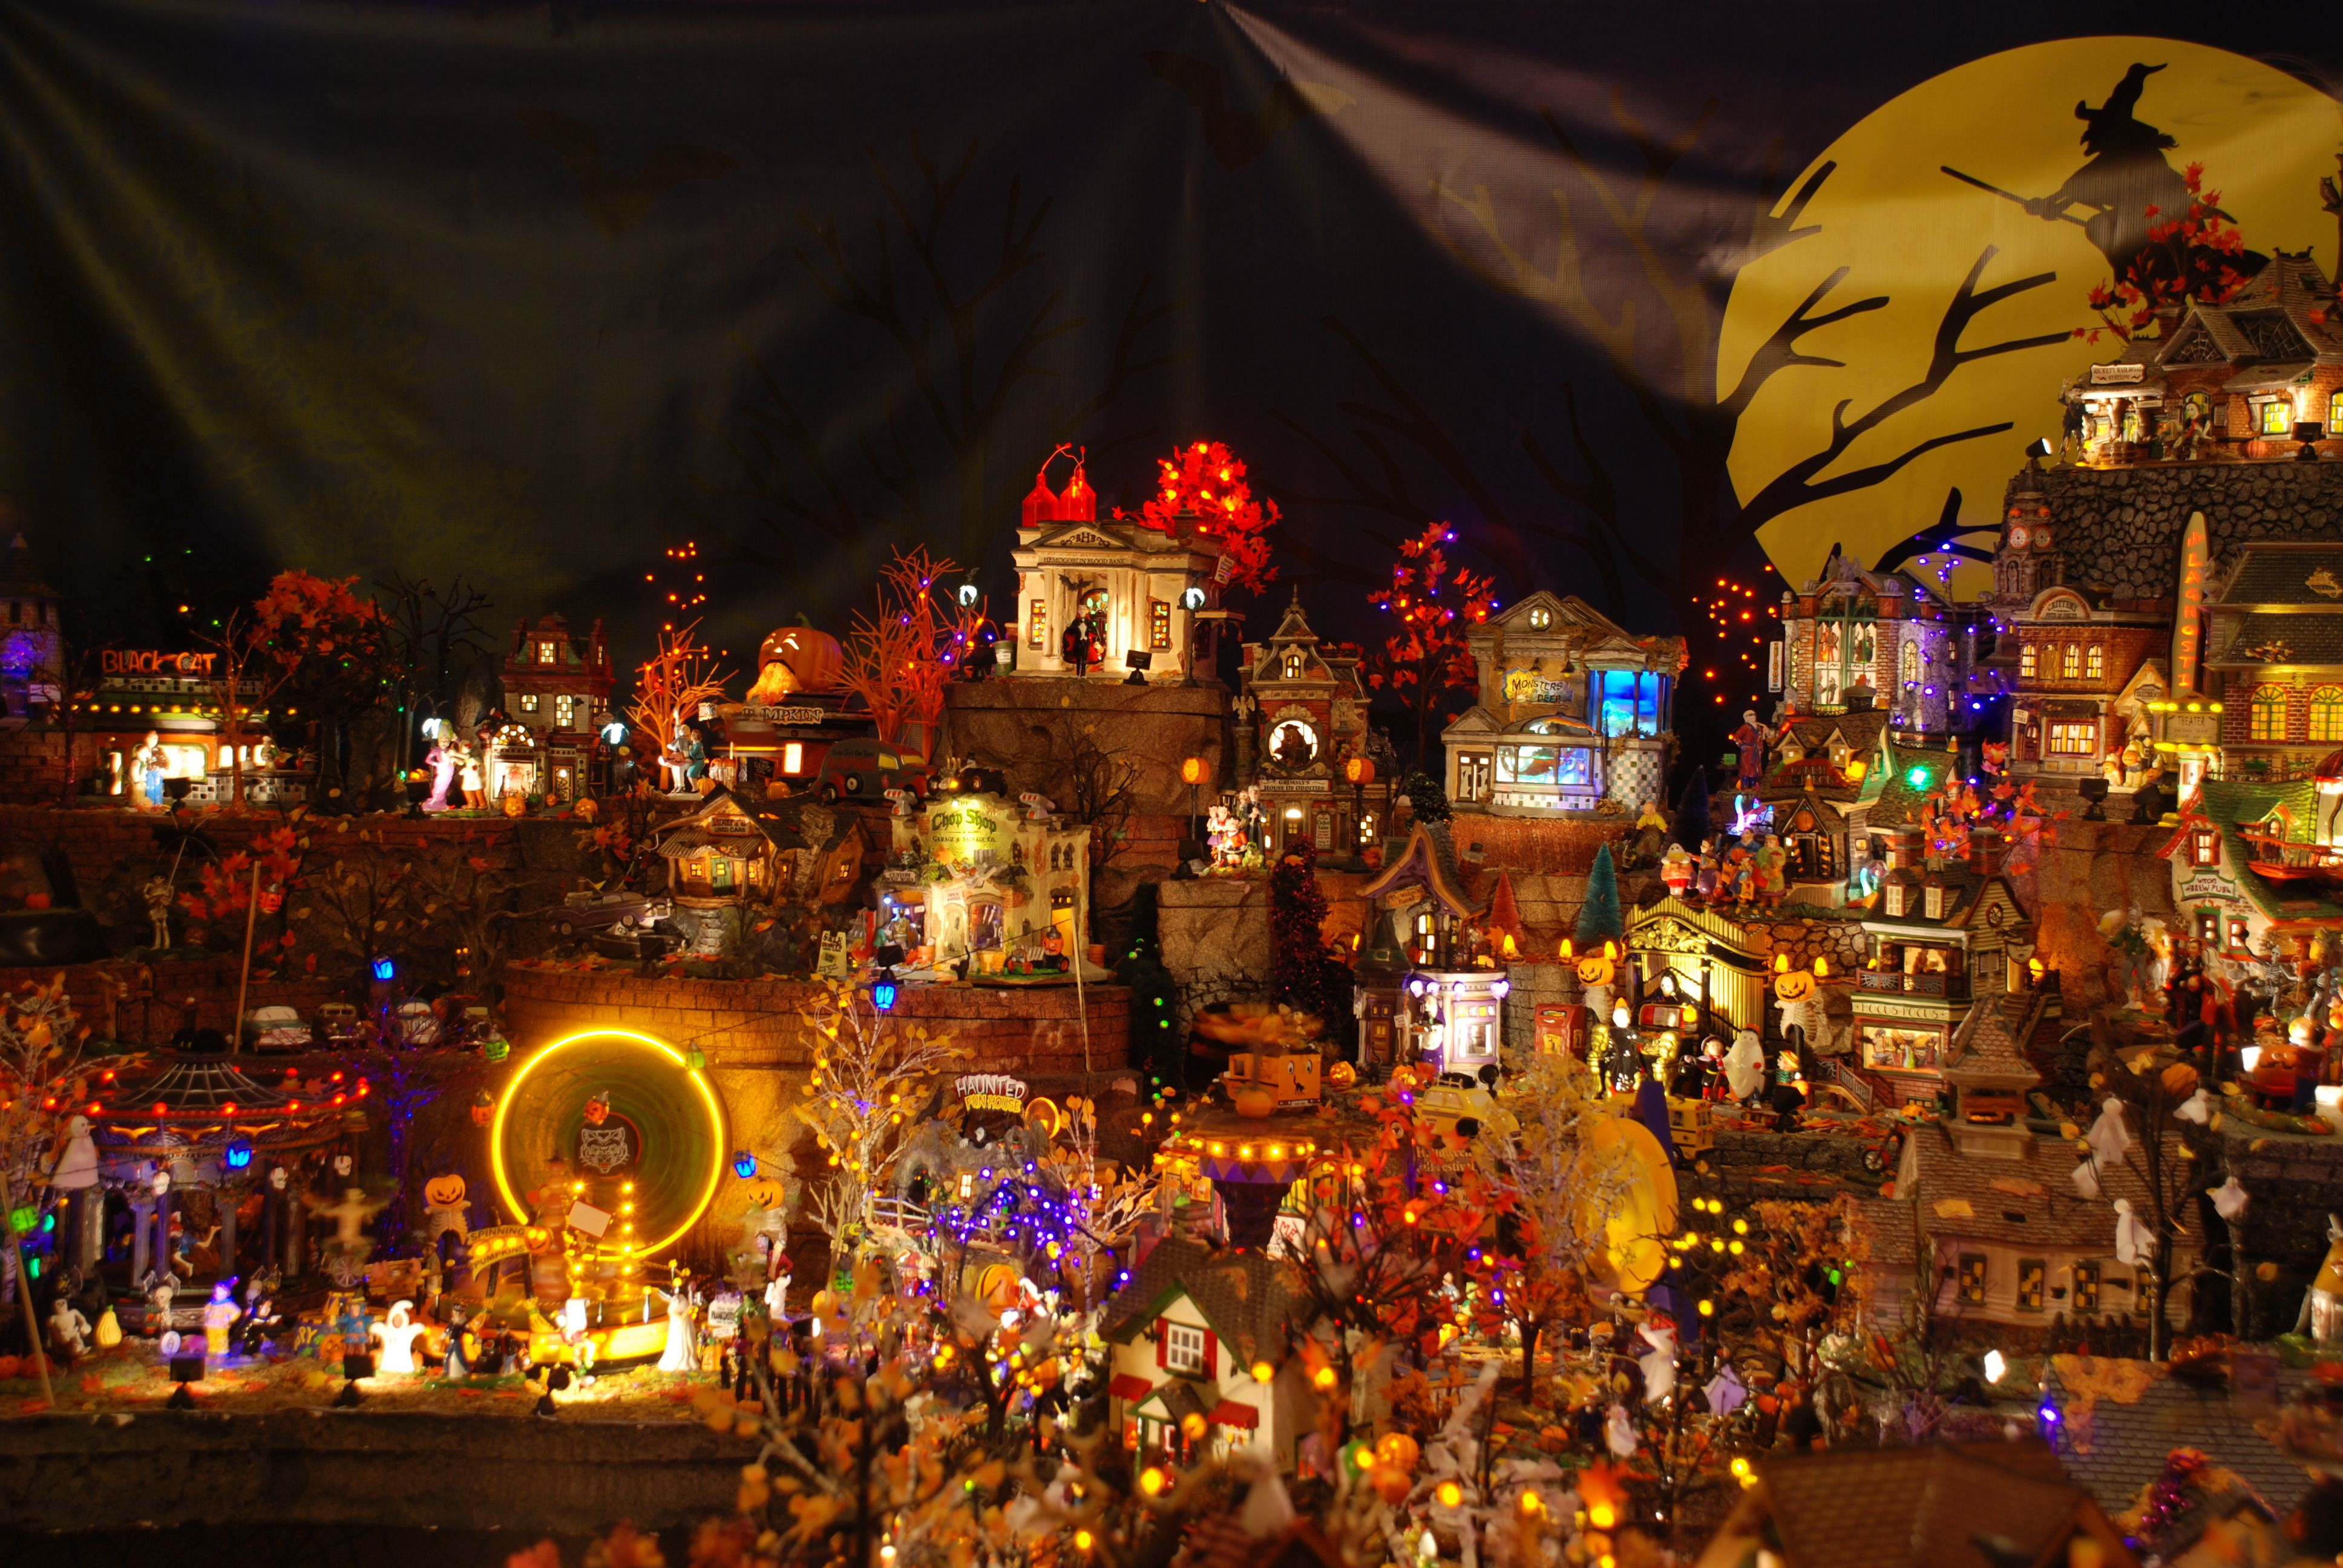 Hallowsville nightmare before christmas village